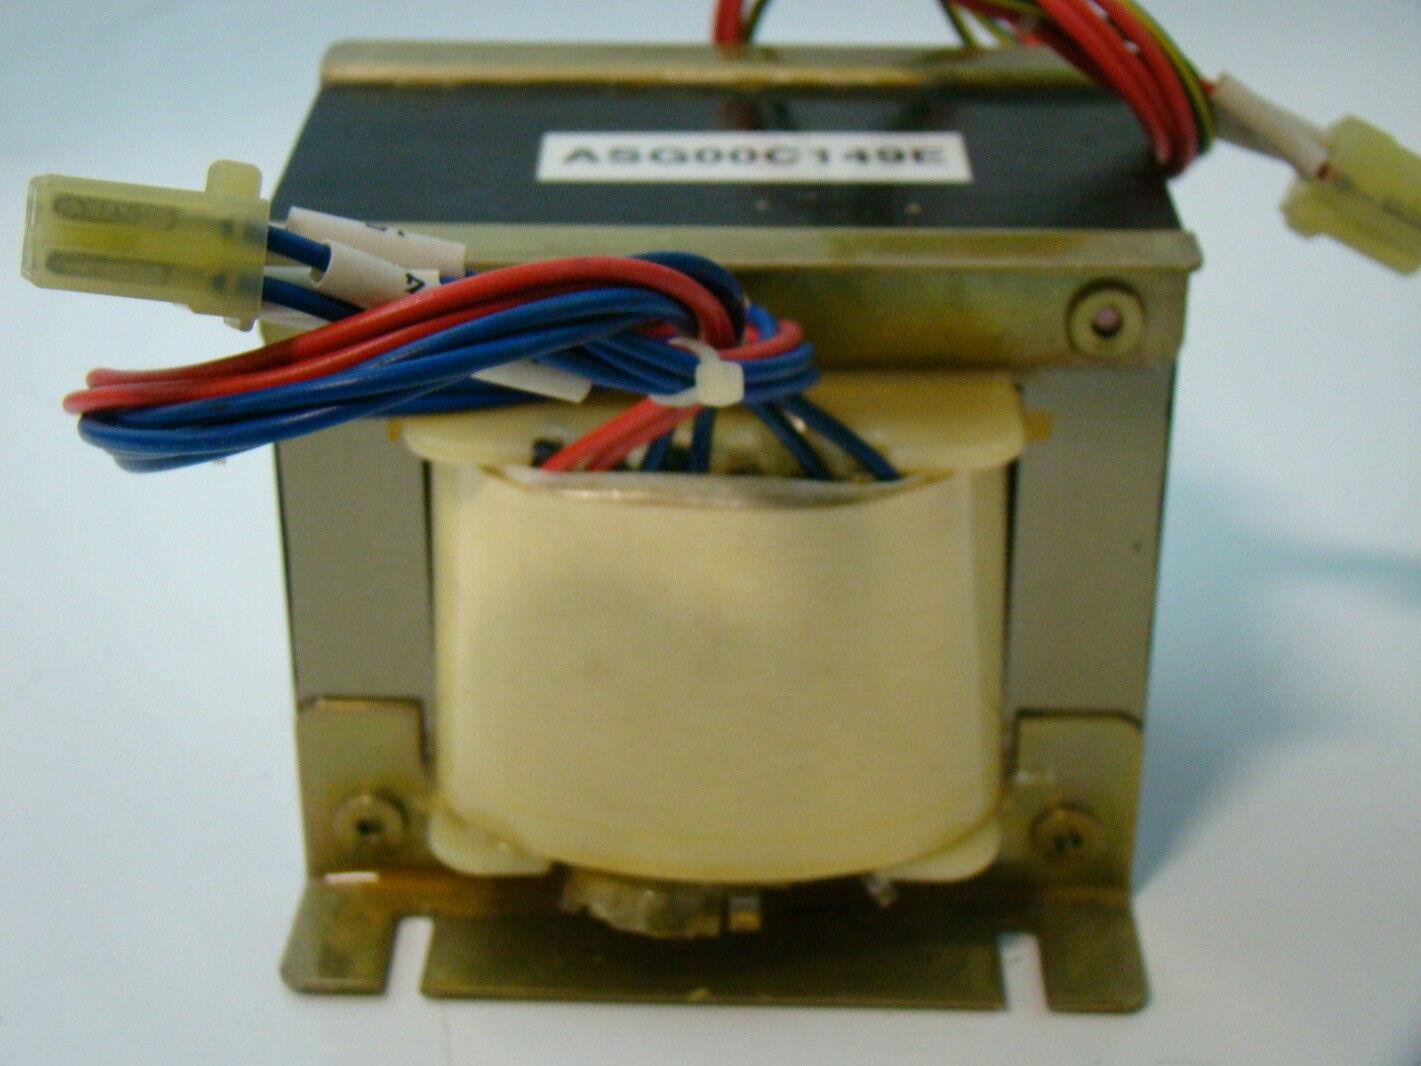 Details about  /Jeil Trans 500VA Transformer ASG00C149B